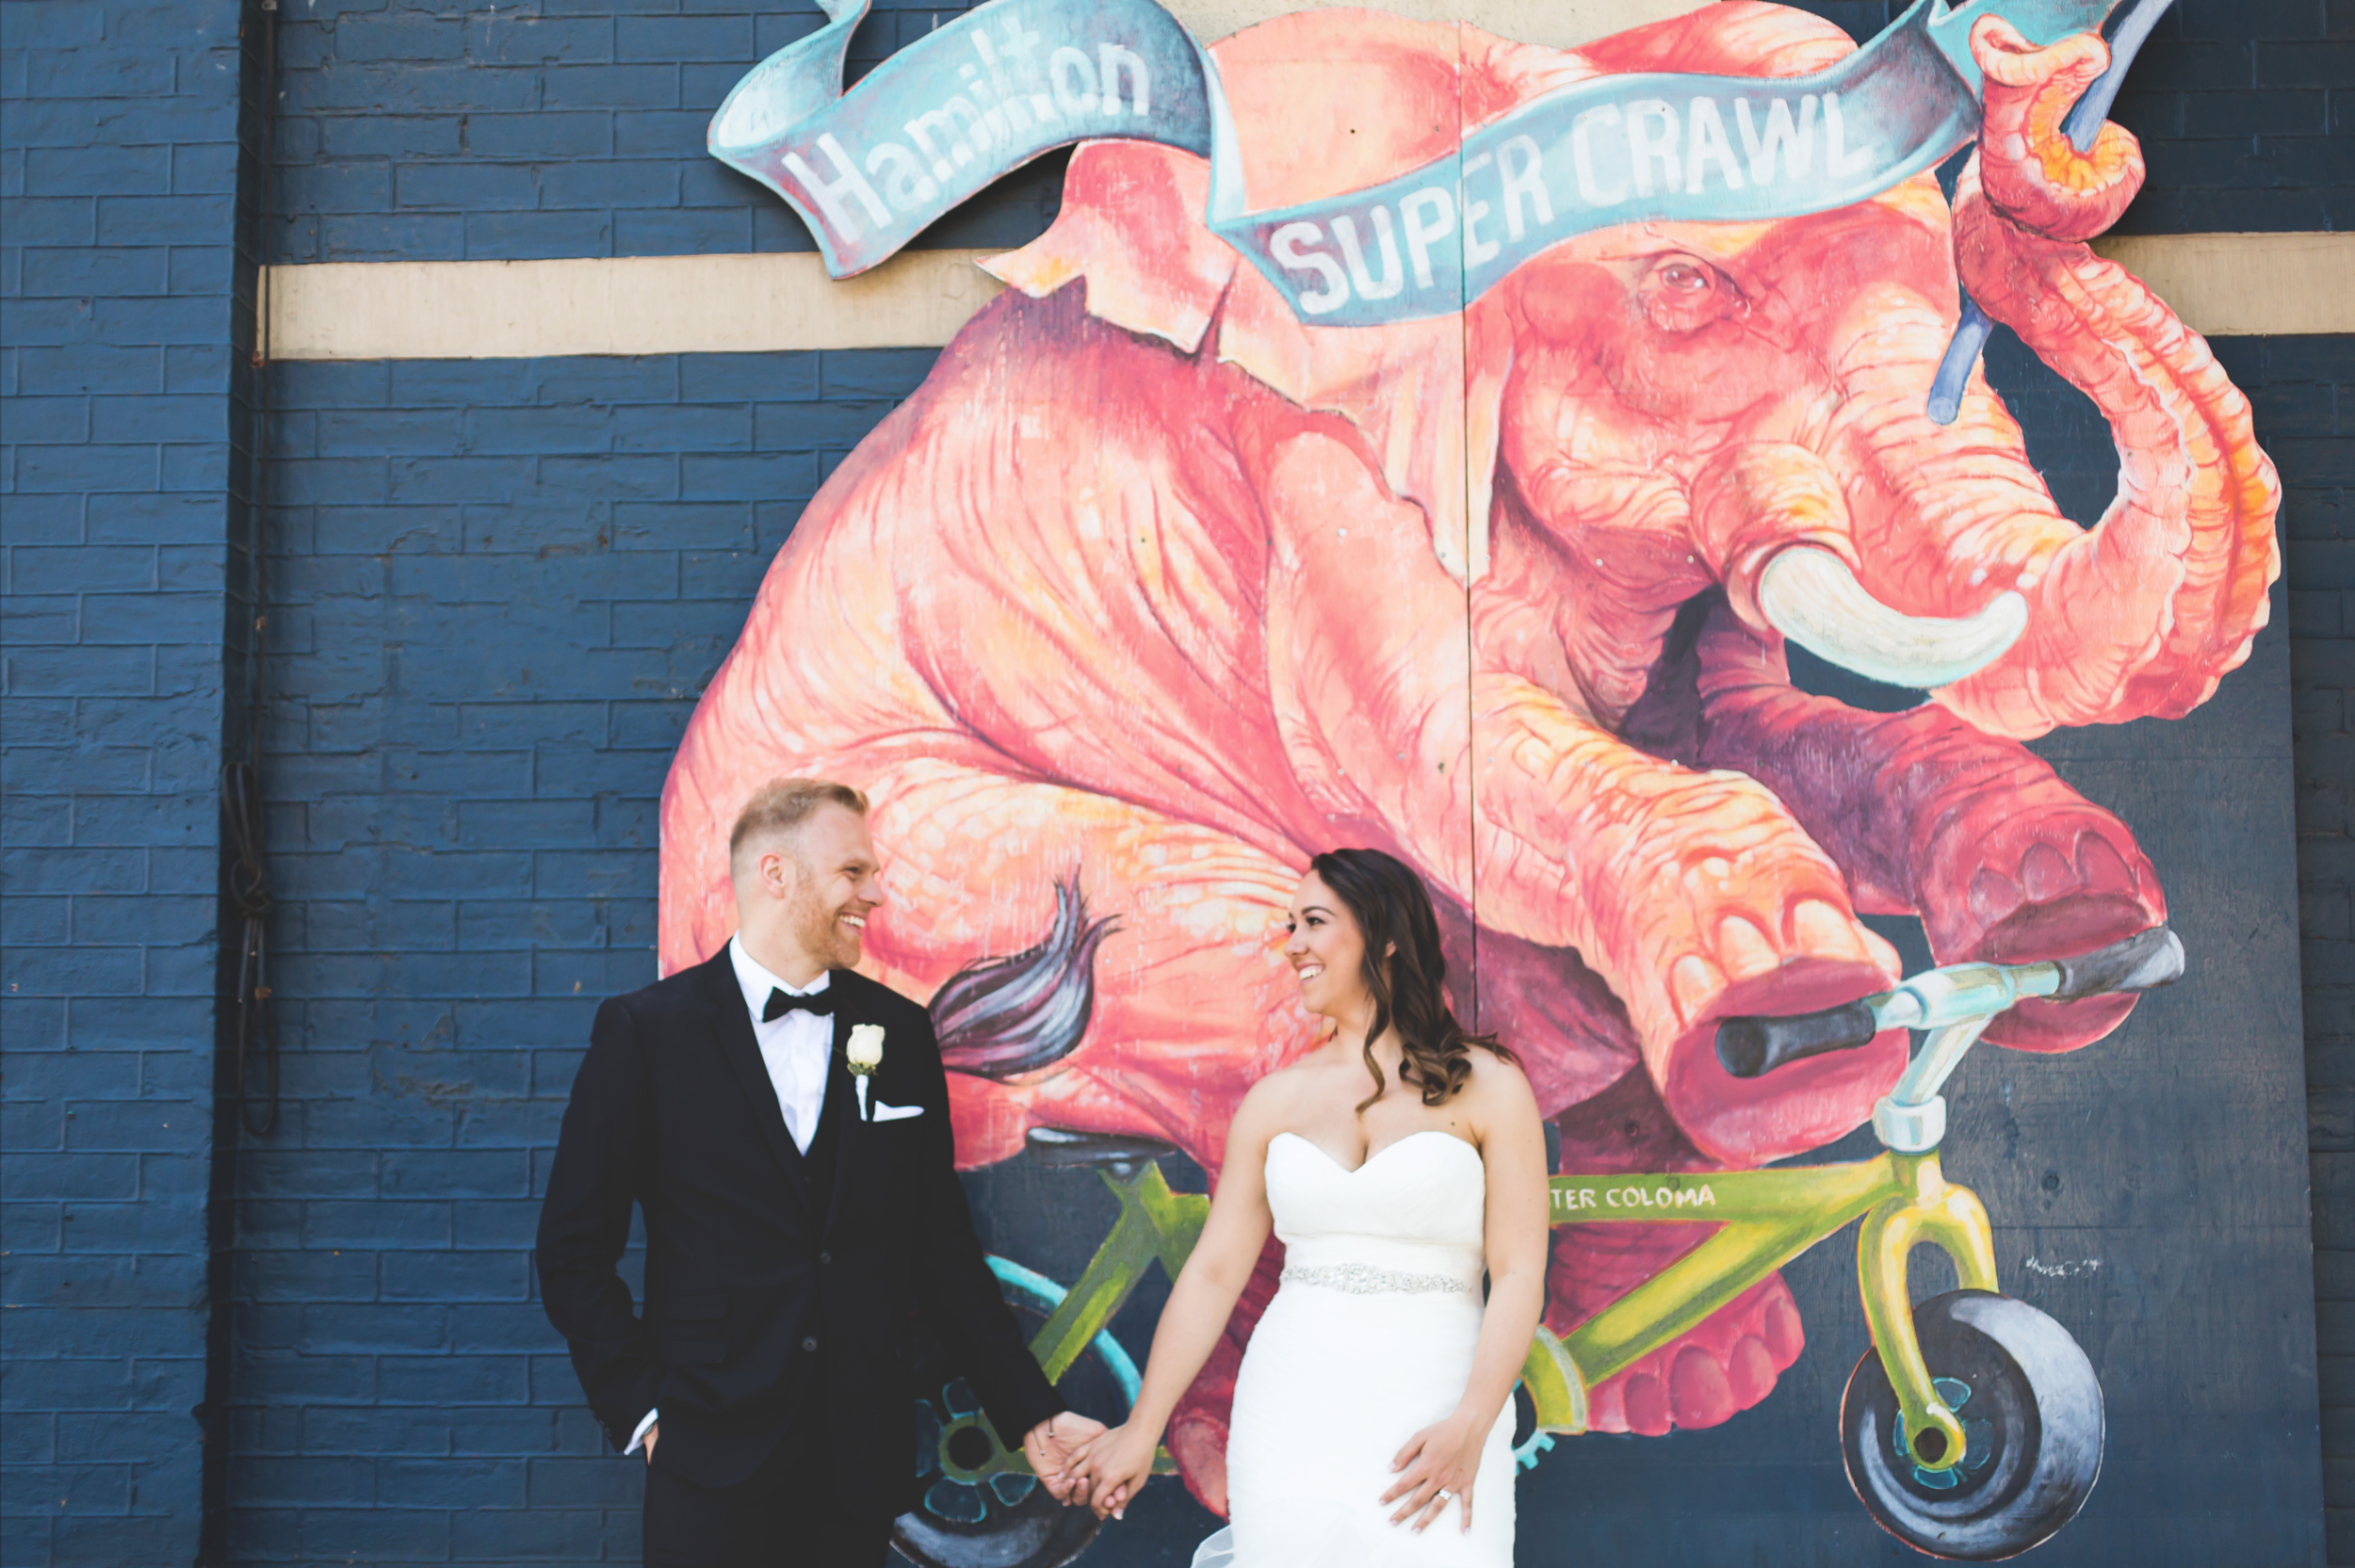 Wedding-Harbour-Banquet-Center-Oakville-Photographer-Wedding-Hamilton-Saint-James-Espresso-Downtown-HamOnt-GTA-Niagara-Toronto-Moments-by-Lauren-Photography-Photo-Image-41.png